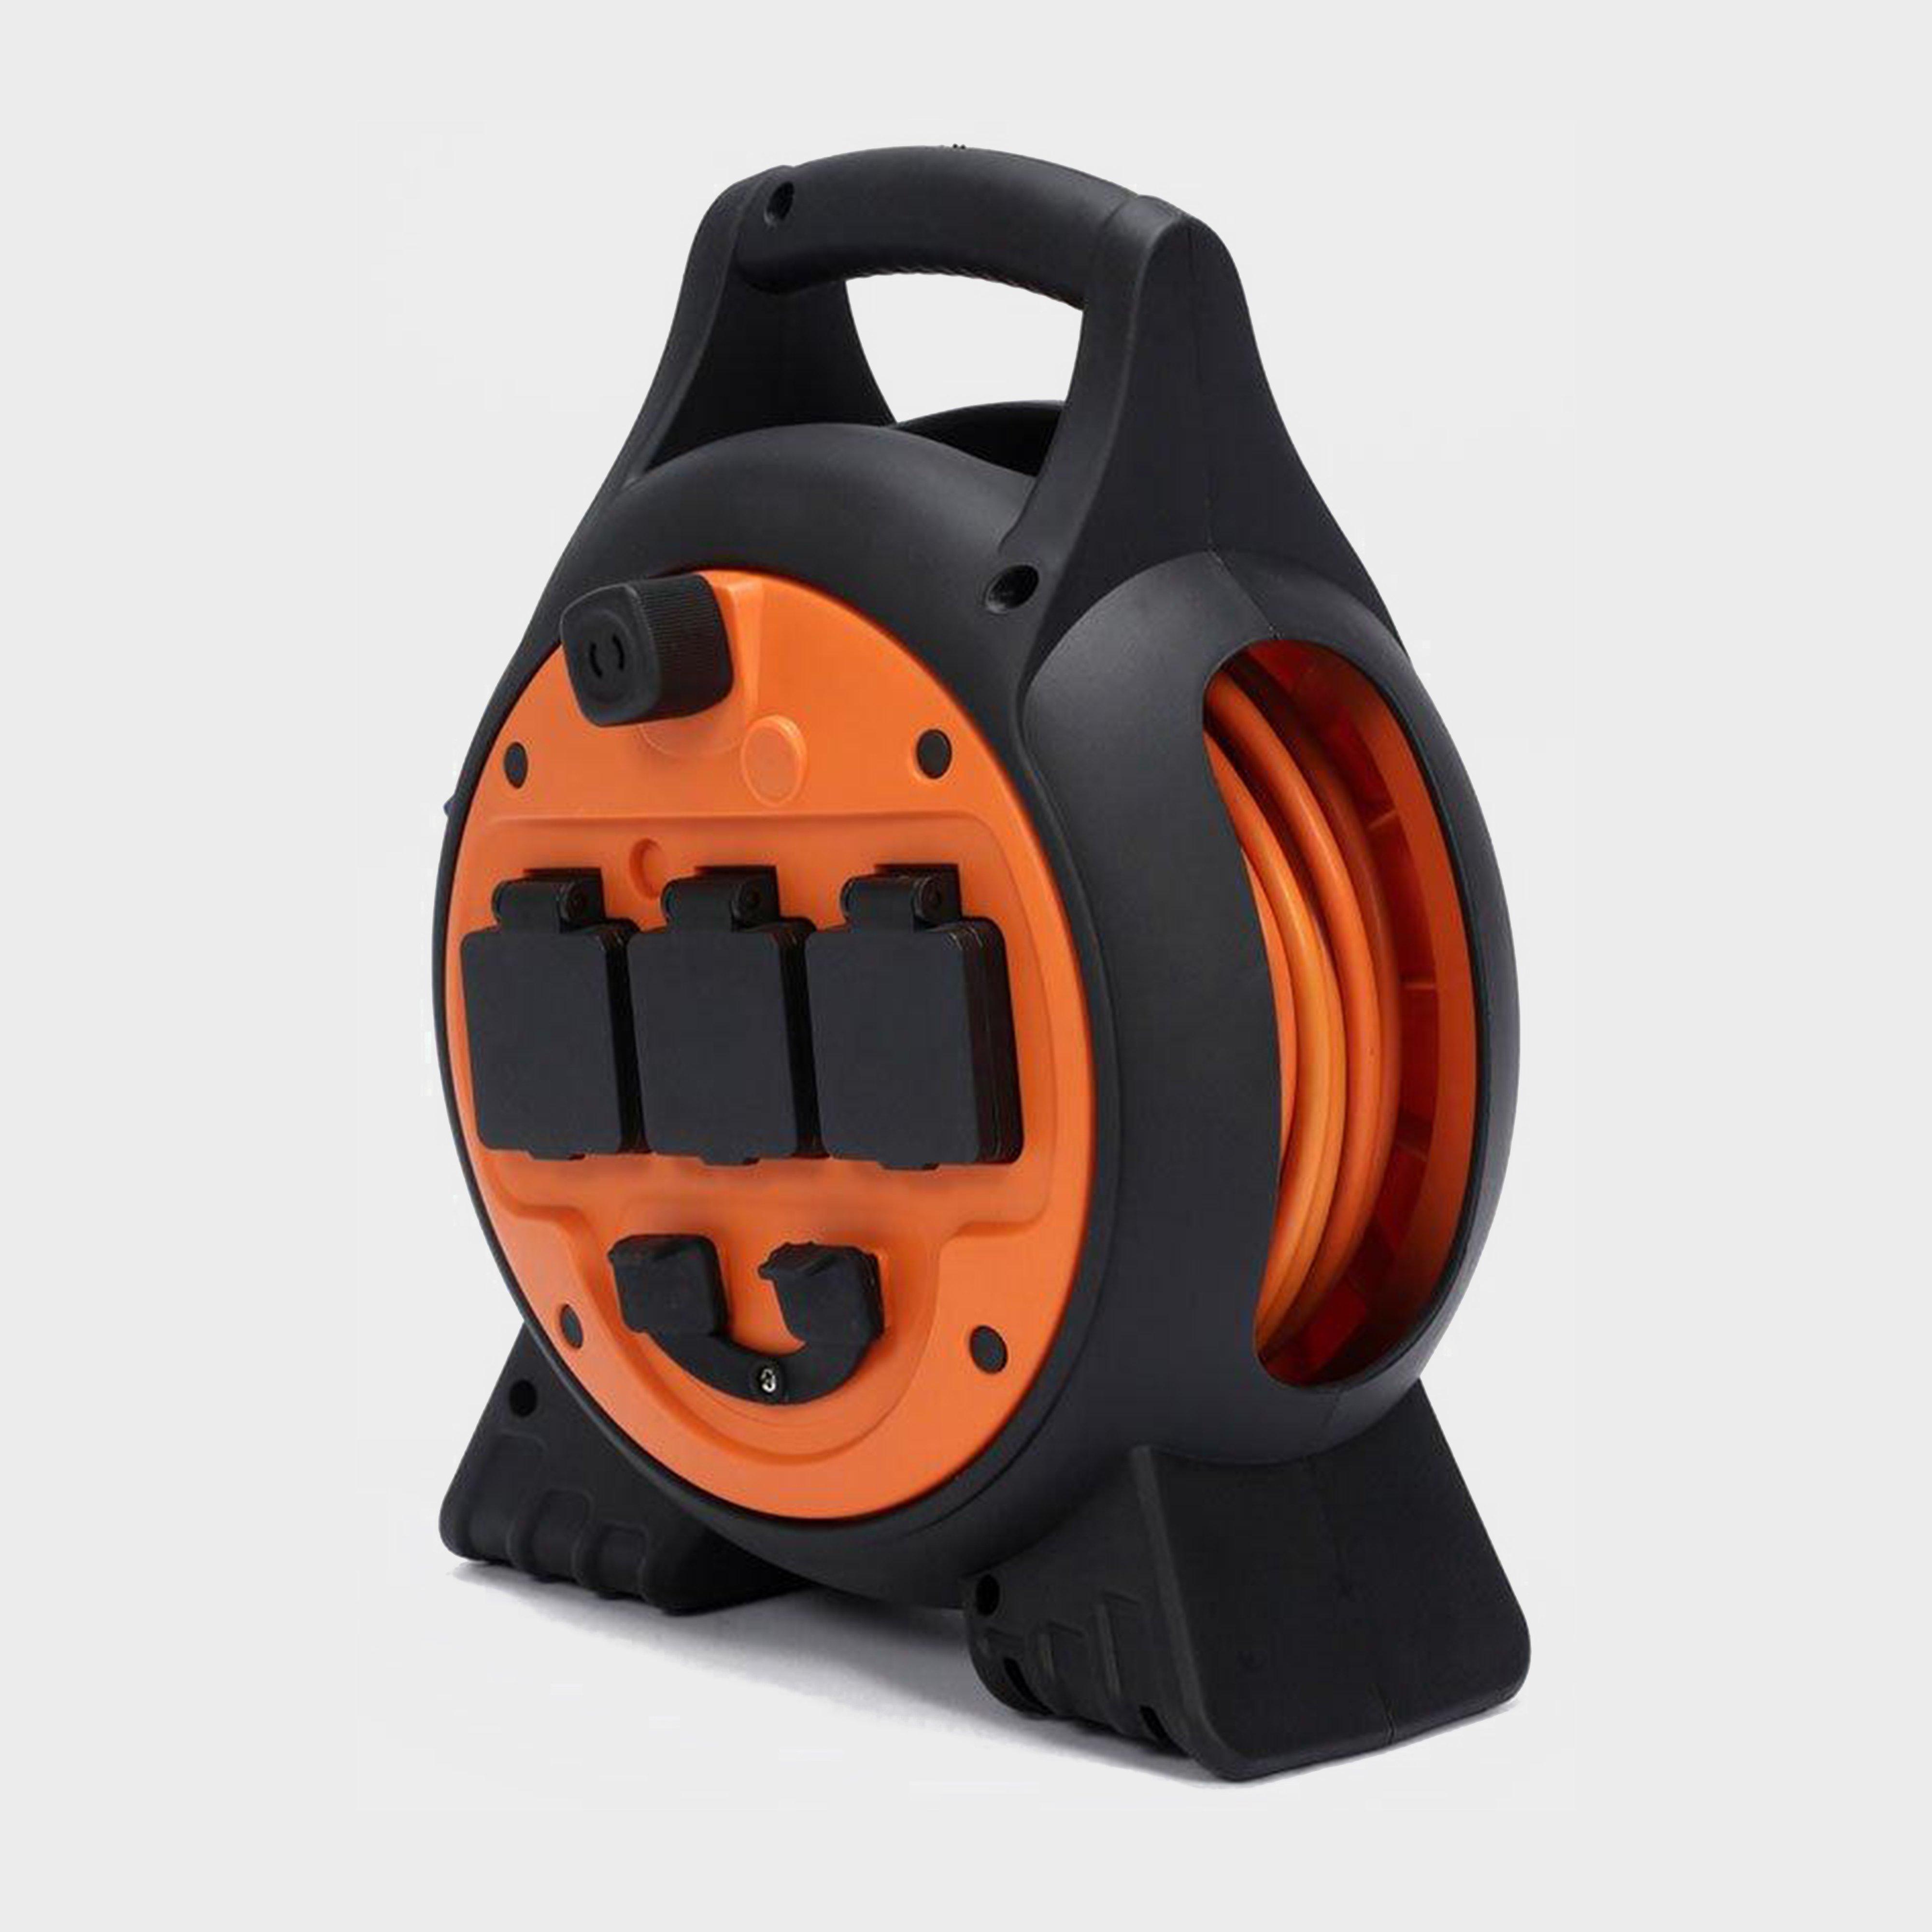 Hi-gear 3way Mobile Mains Reel - Orange/black  Orange/black